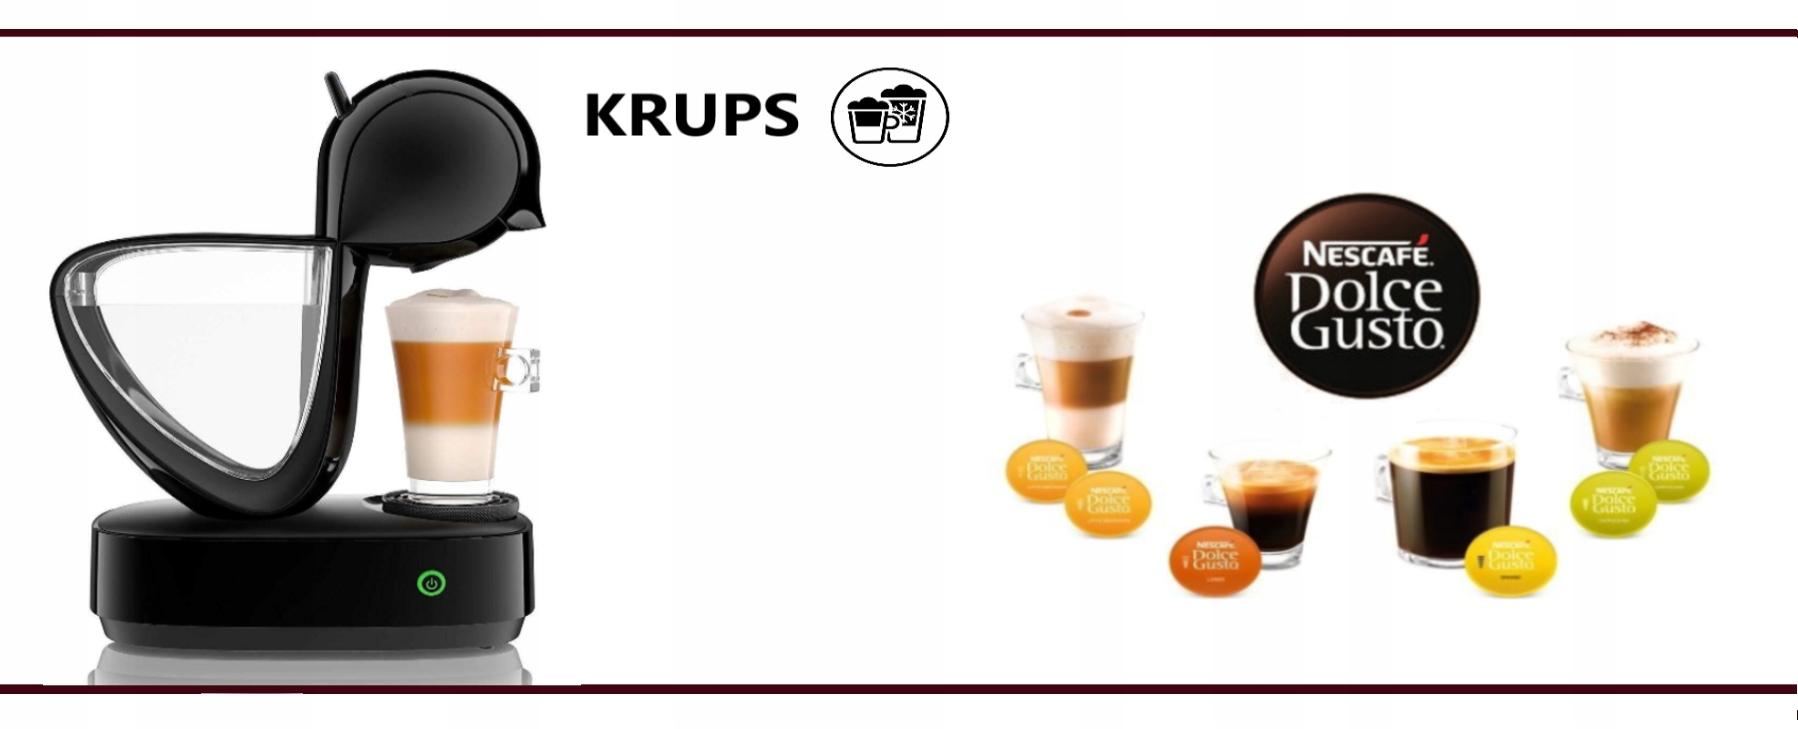 Krups Dolce Gusto INFINISSIMA кофемашина для капсул Глубина продукта 28 см